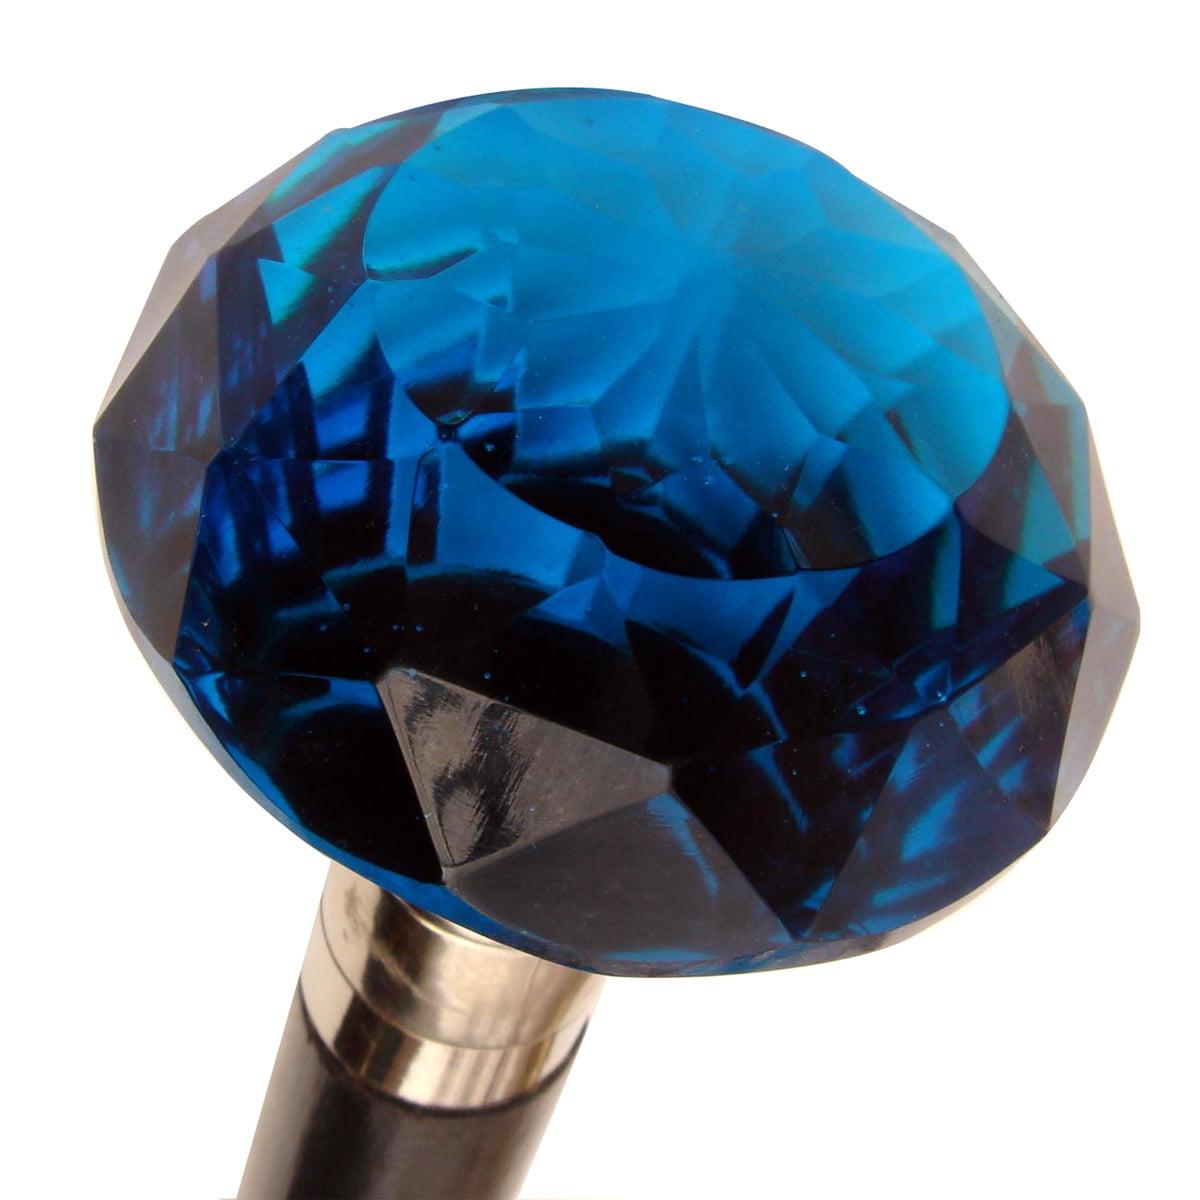 COBALT BLUE CUT GLASS KNOB CARNIVAL WALKING STICK CANE